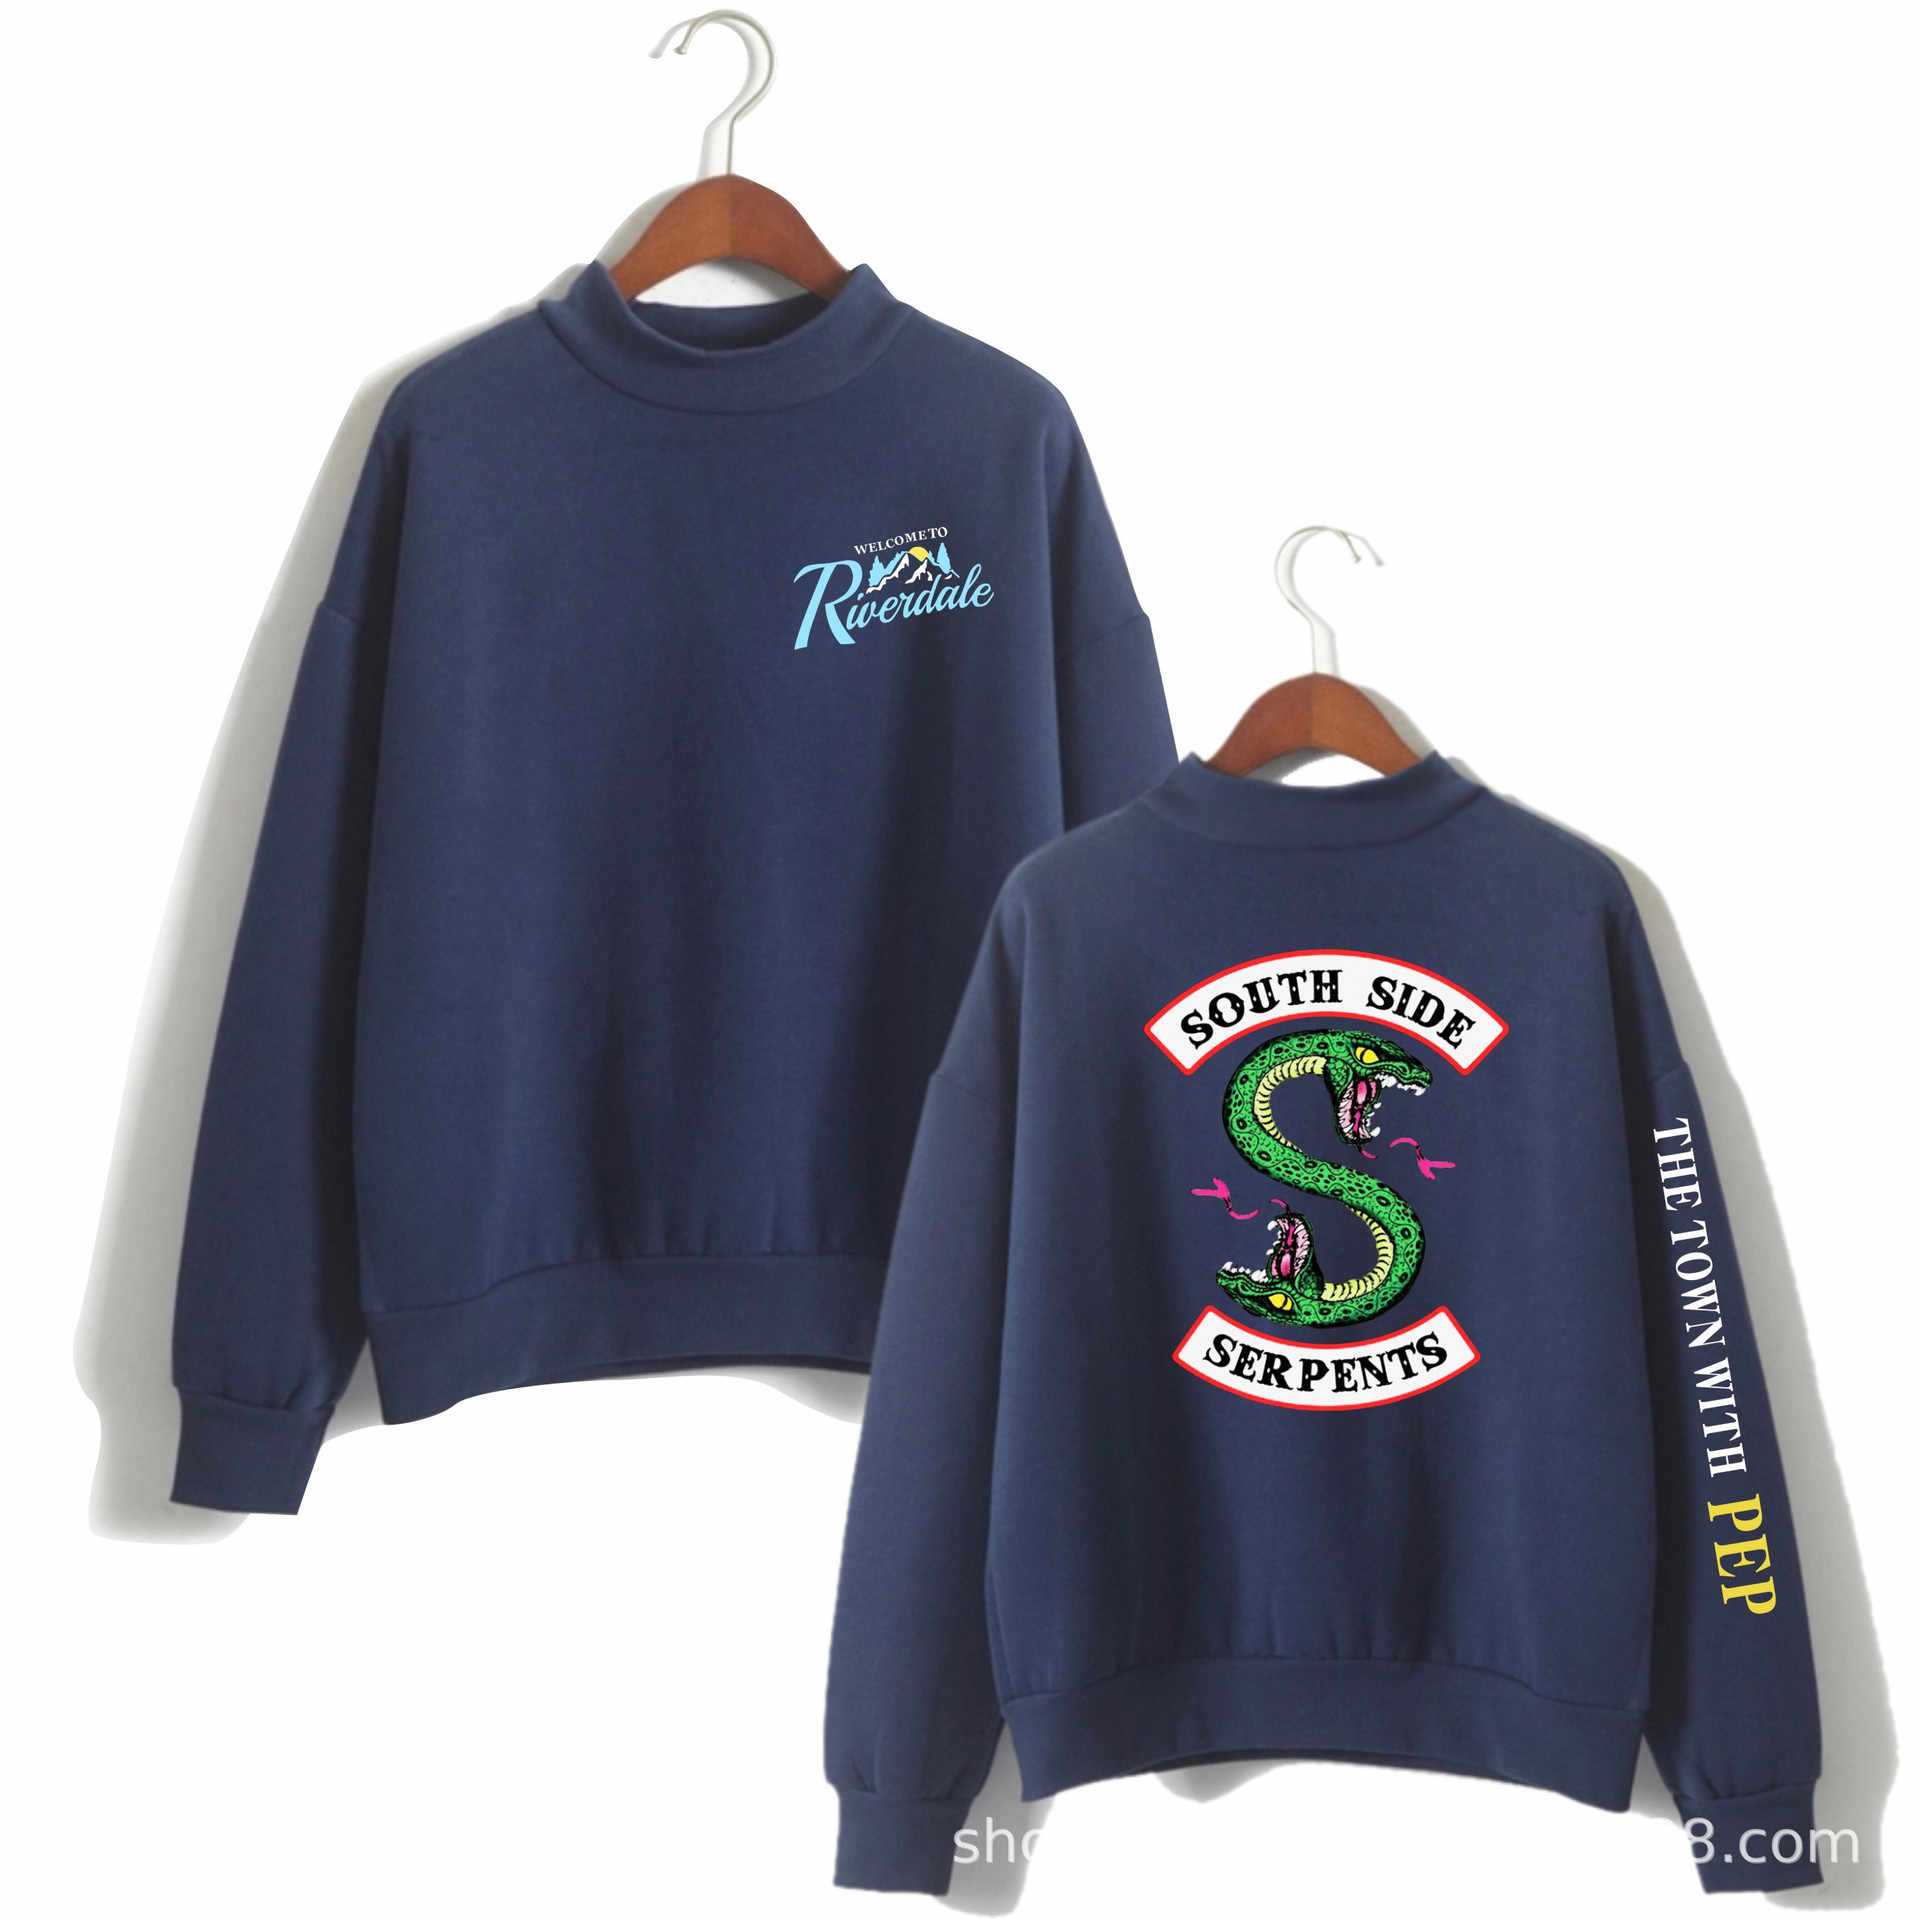 kpop Riverdale Pink Women Men Hoodies Sweatshirts Fashion Hooded Mulheres Long Sleeve Korean Sweatshirt Casual Clothing 4XL Tops